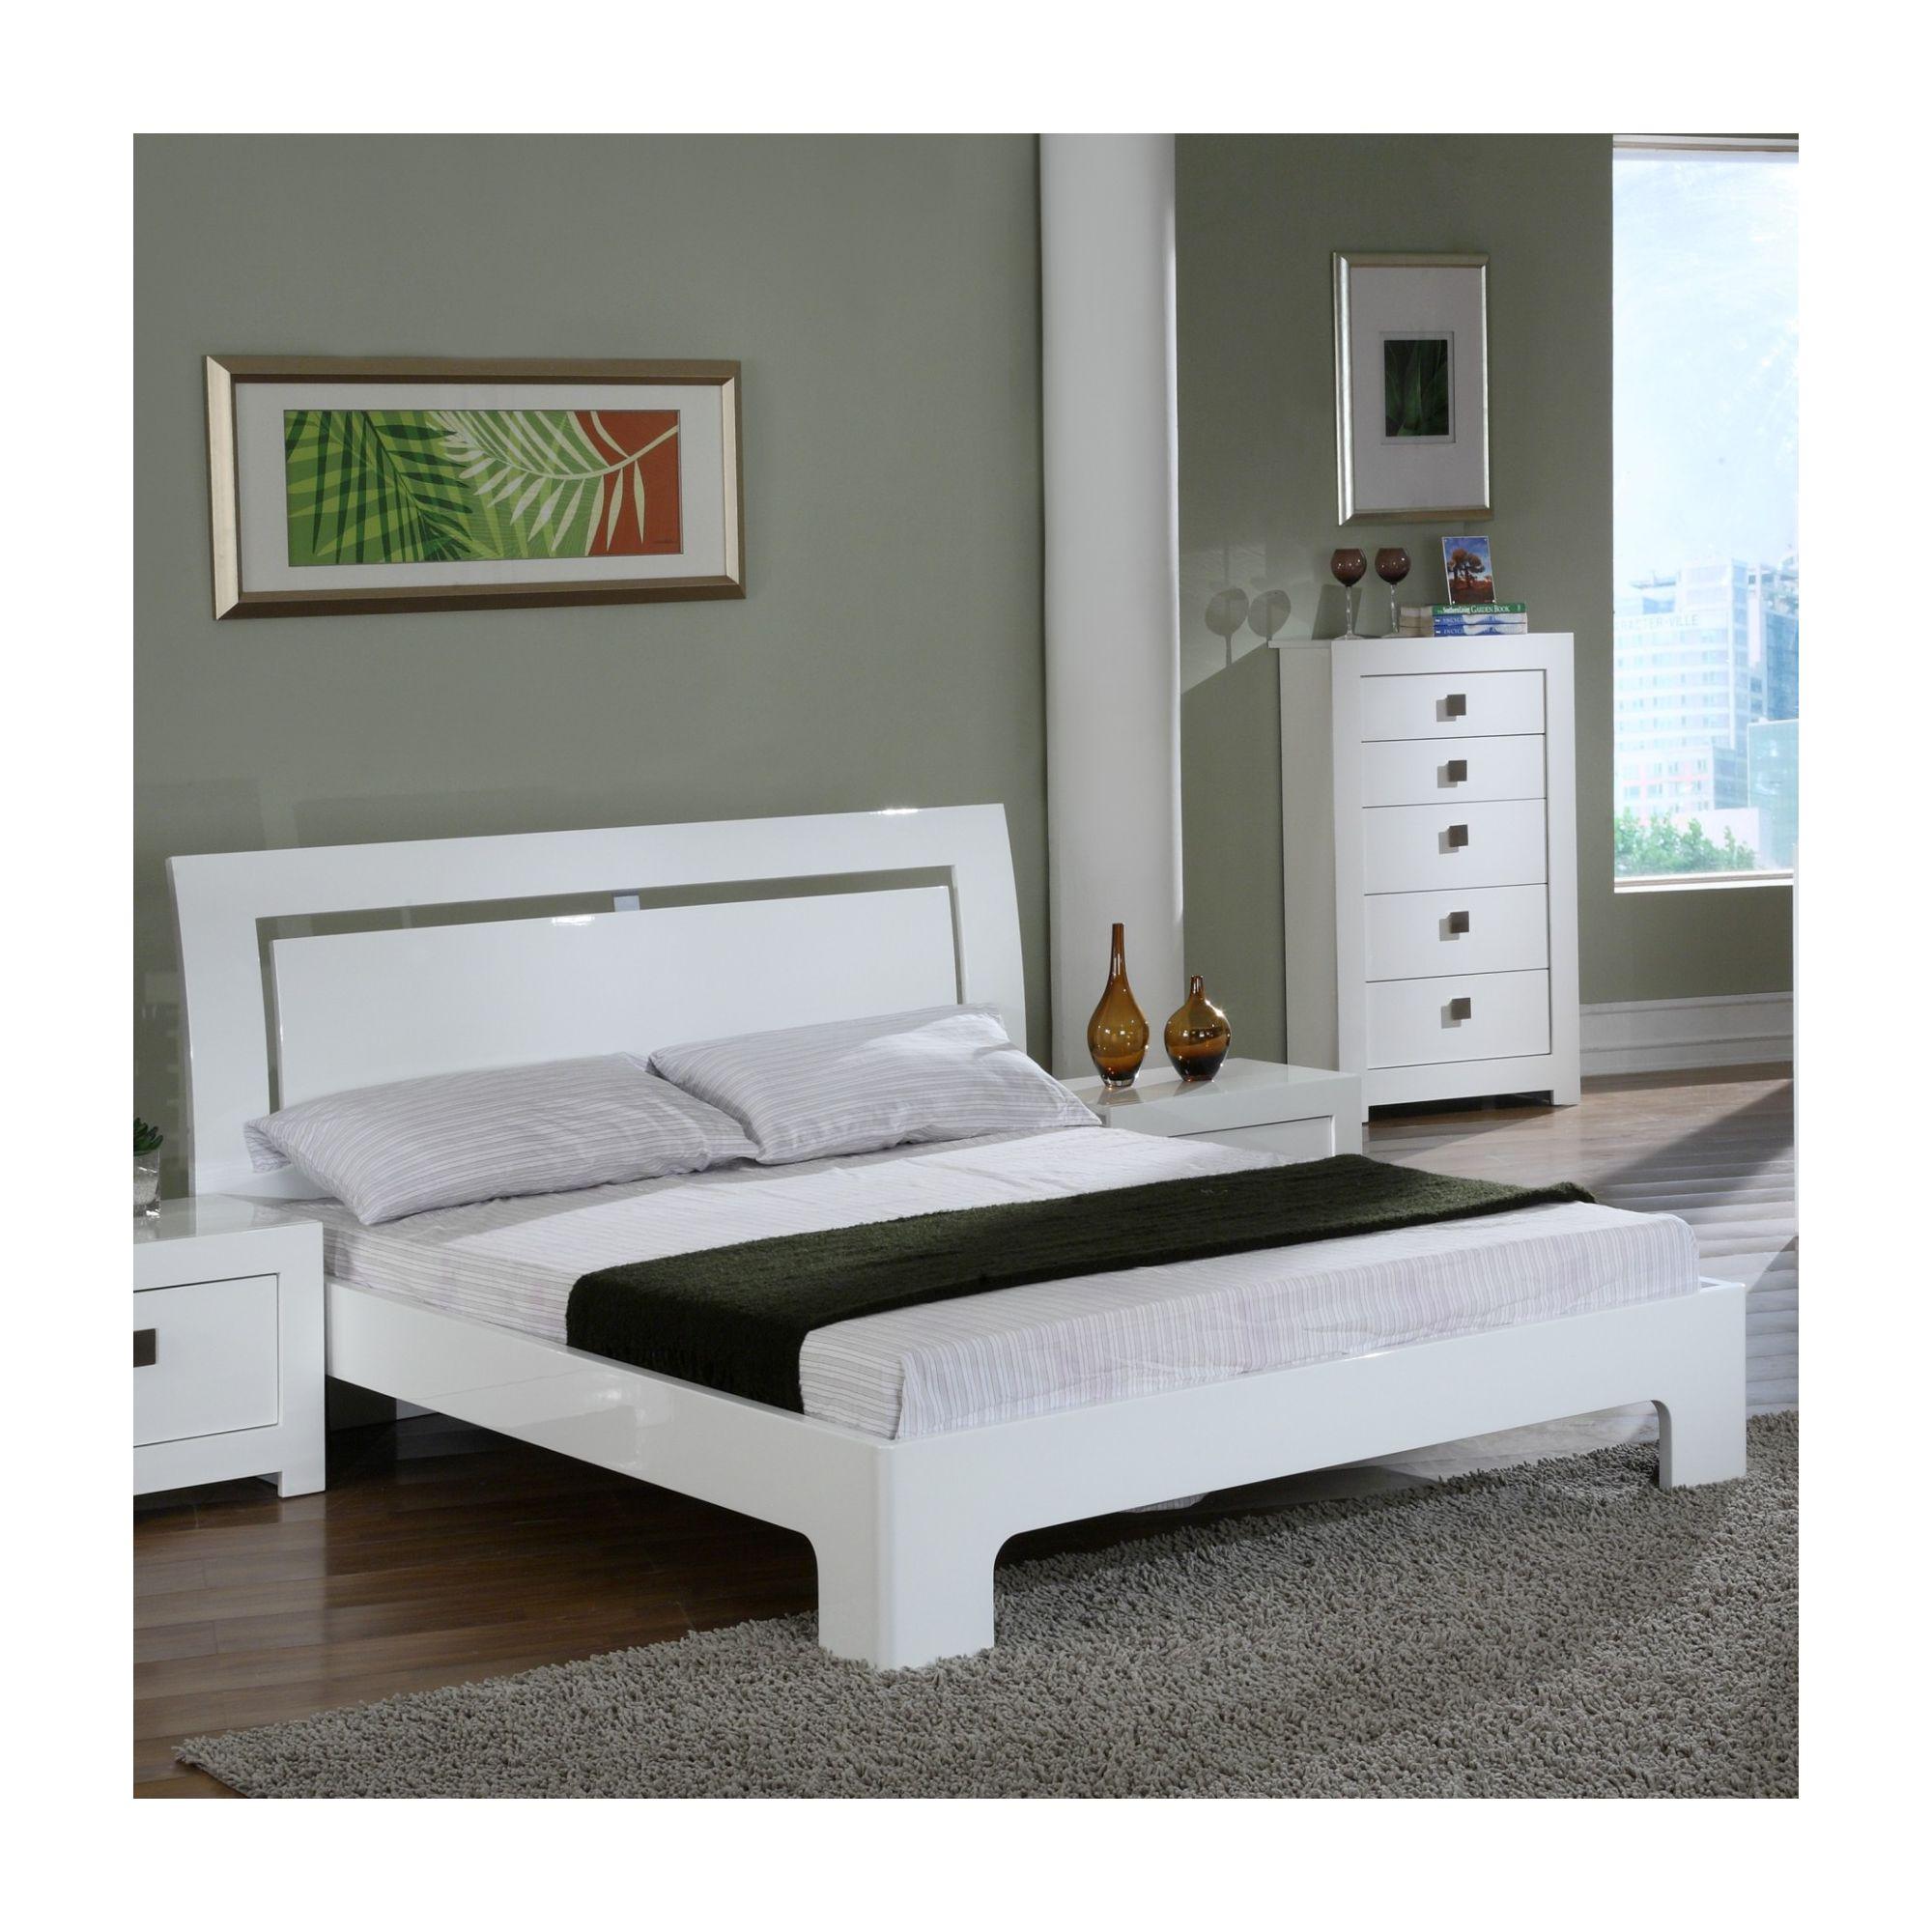 World Furniture Bari Bed Frame - Kingsize at Tesco Direct